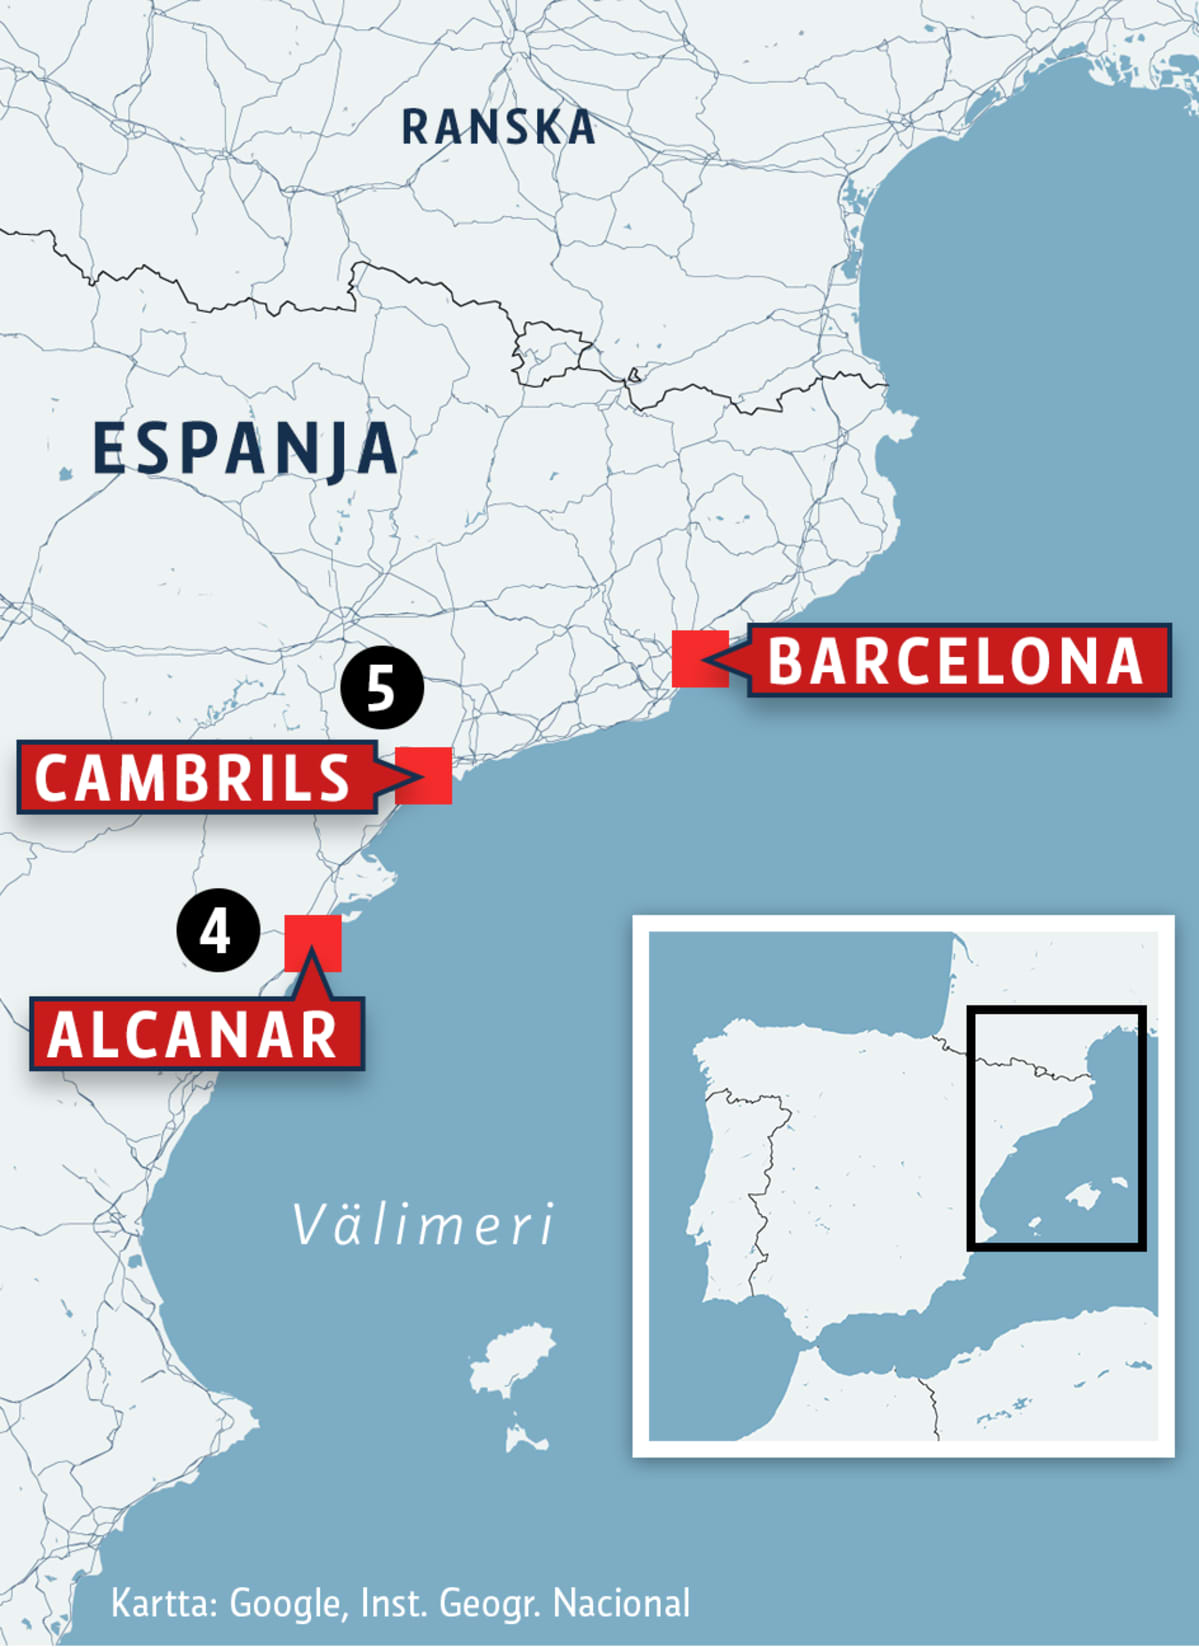 Espanjan rannikko.